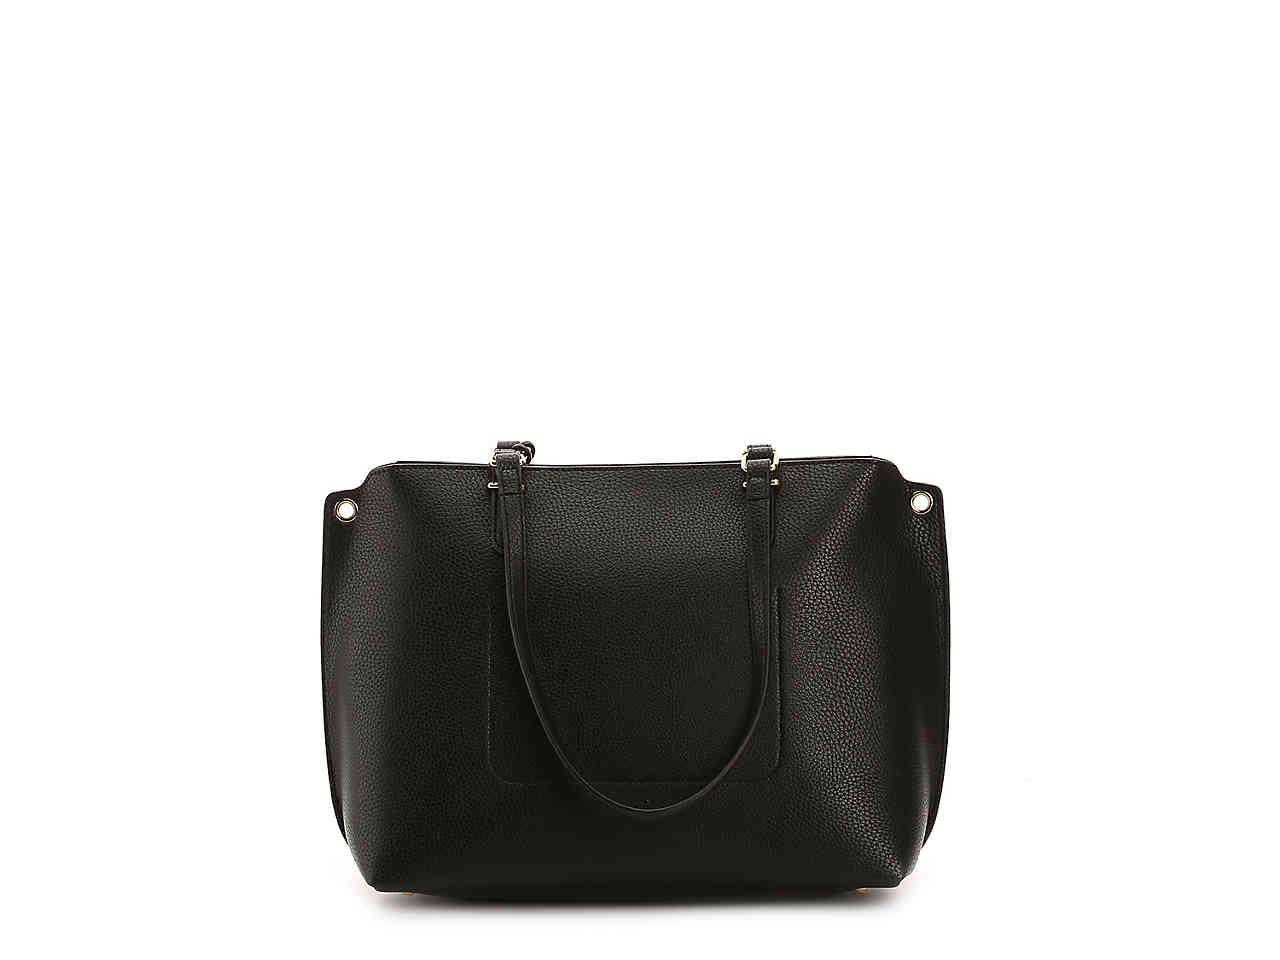 2ea4e2dcd2 Lyst - Lauren by Ralph Lauren Anfield Ii Shopper Shoulder Bag in Black